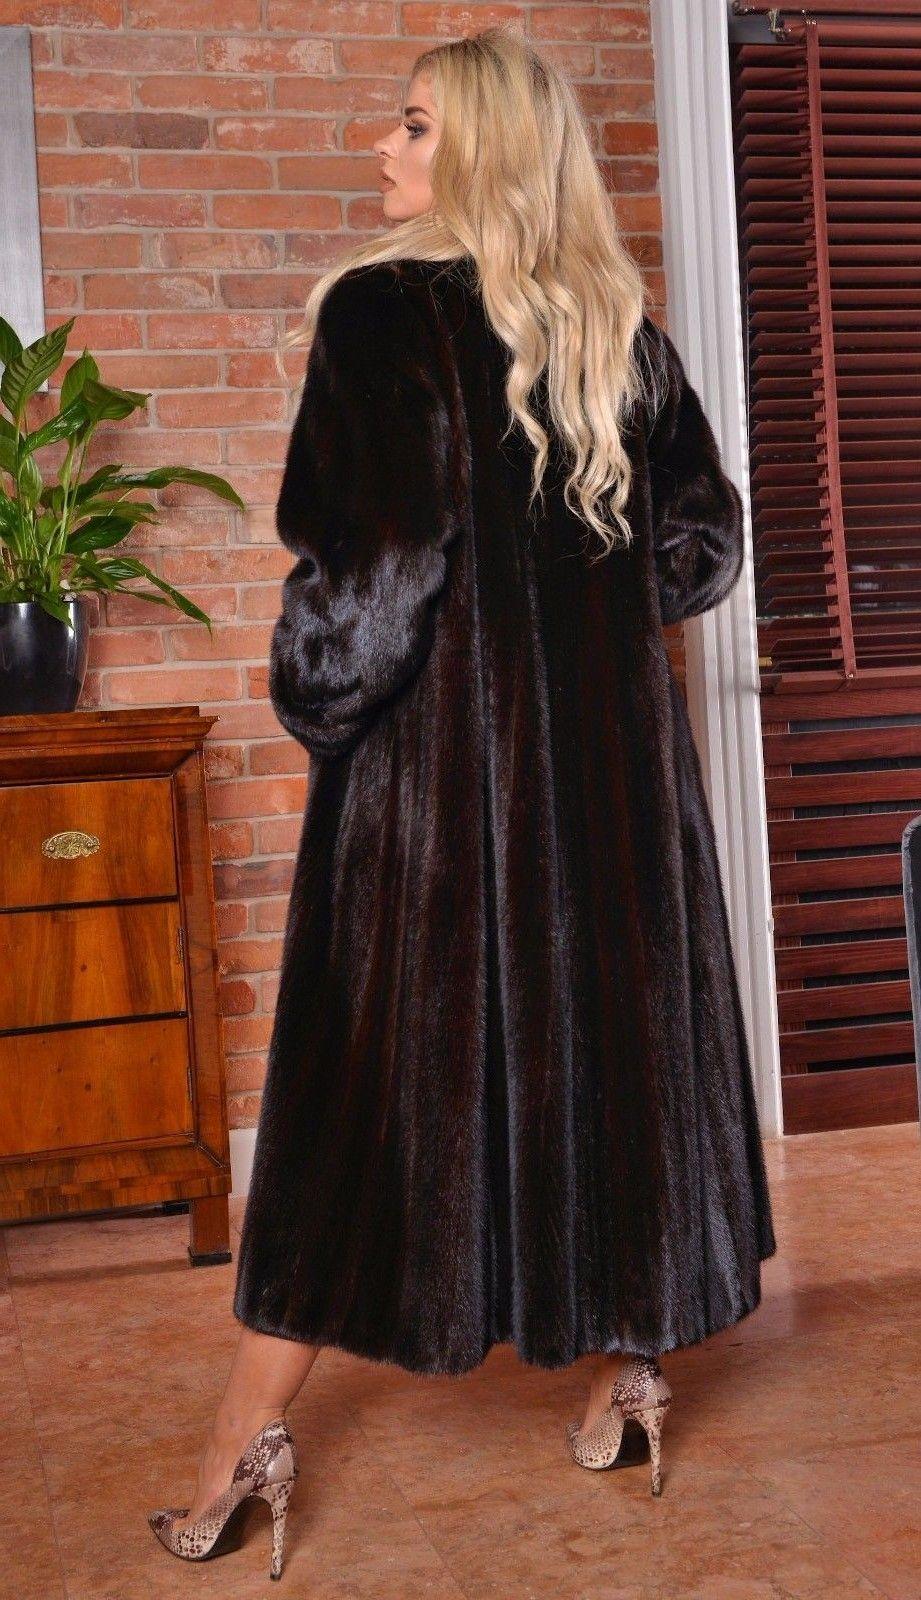 08442999e7 Long Hair and Black Mink | WonderFur in 2019 | Fur coat outfit, Fur ...